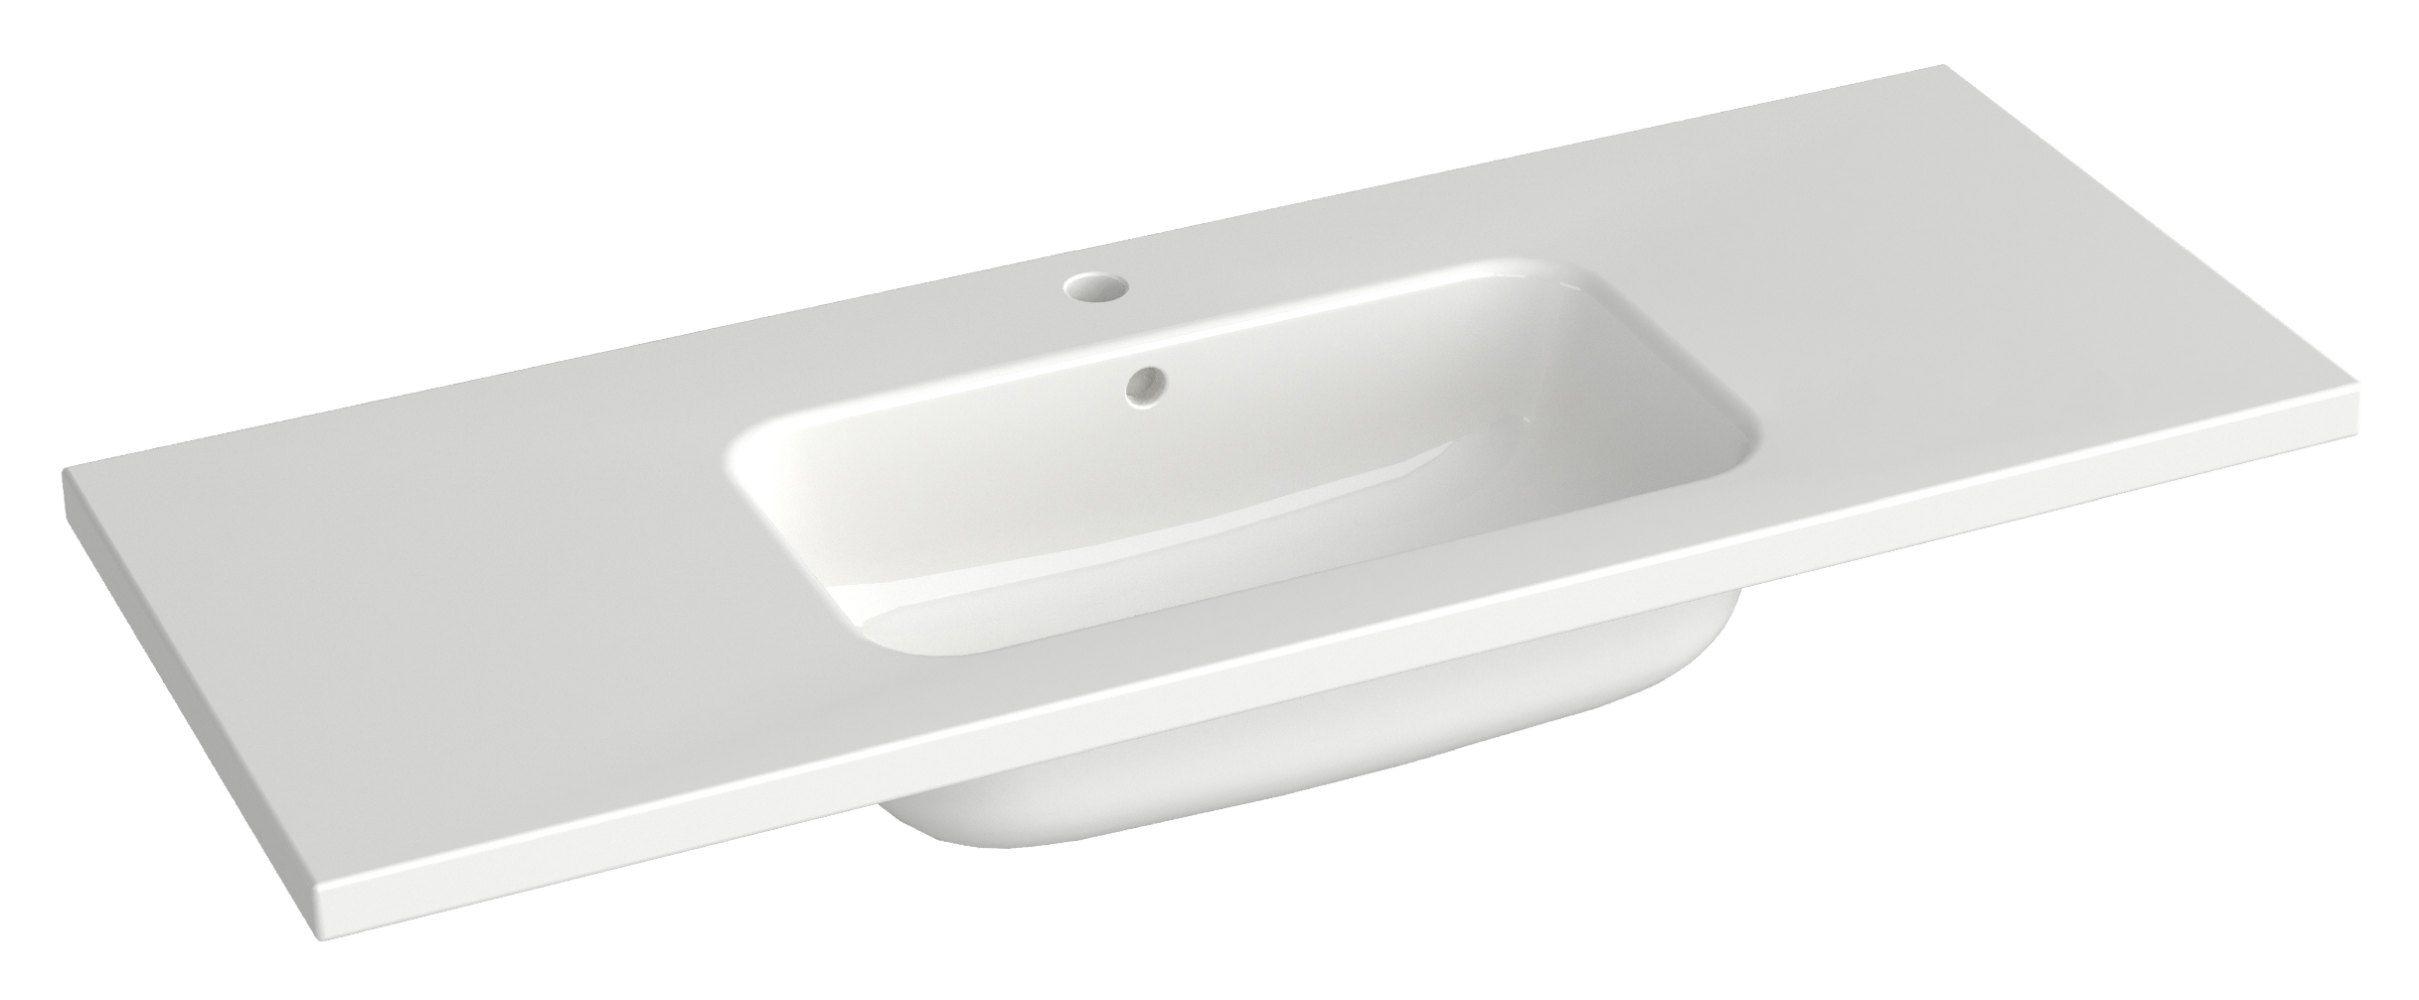 Bad - Waschbecken Dhule 22, Farbe: Weiß – 10 x 121 x 46 cm (H x B x T)